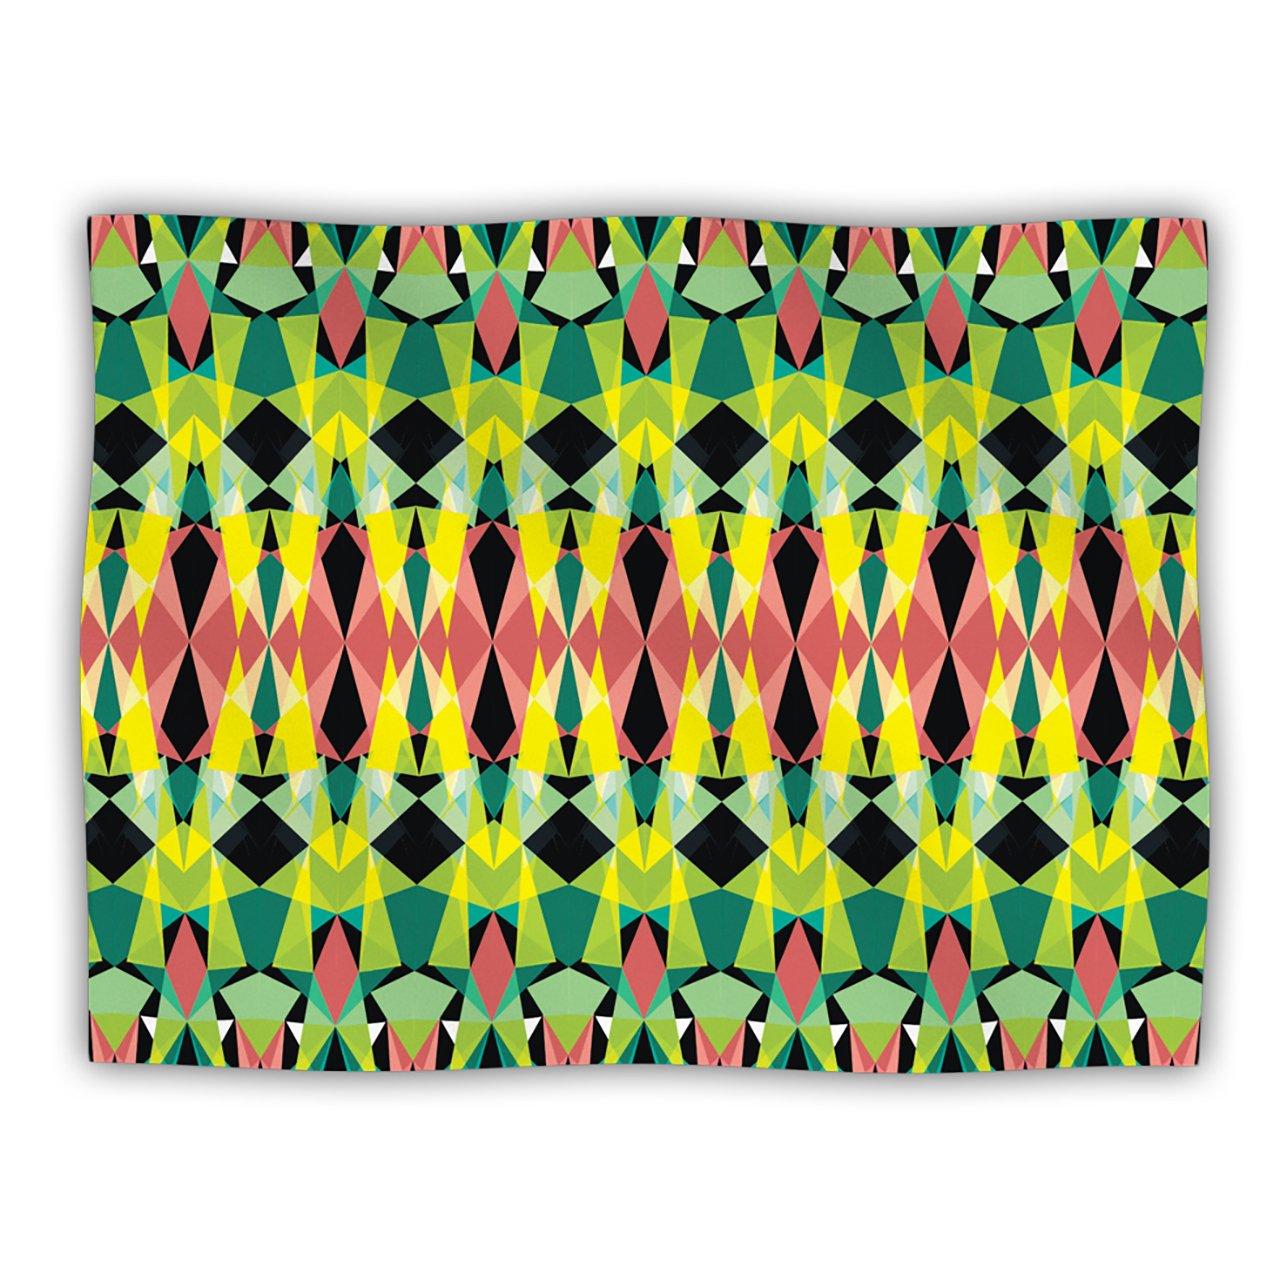 Kess InHouse Akwaflorell T-Vision Dog Blanket, 60 by 50-Inch